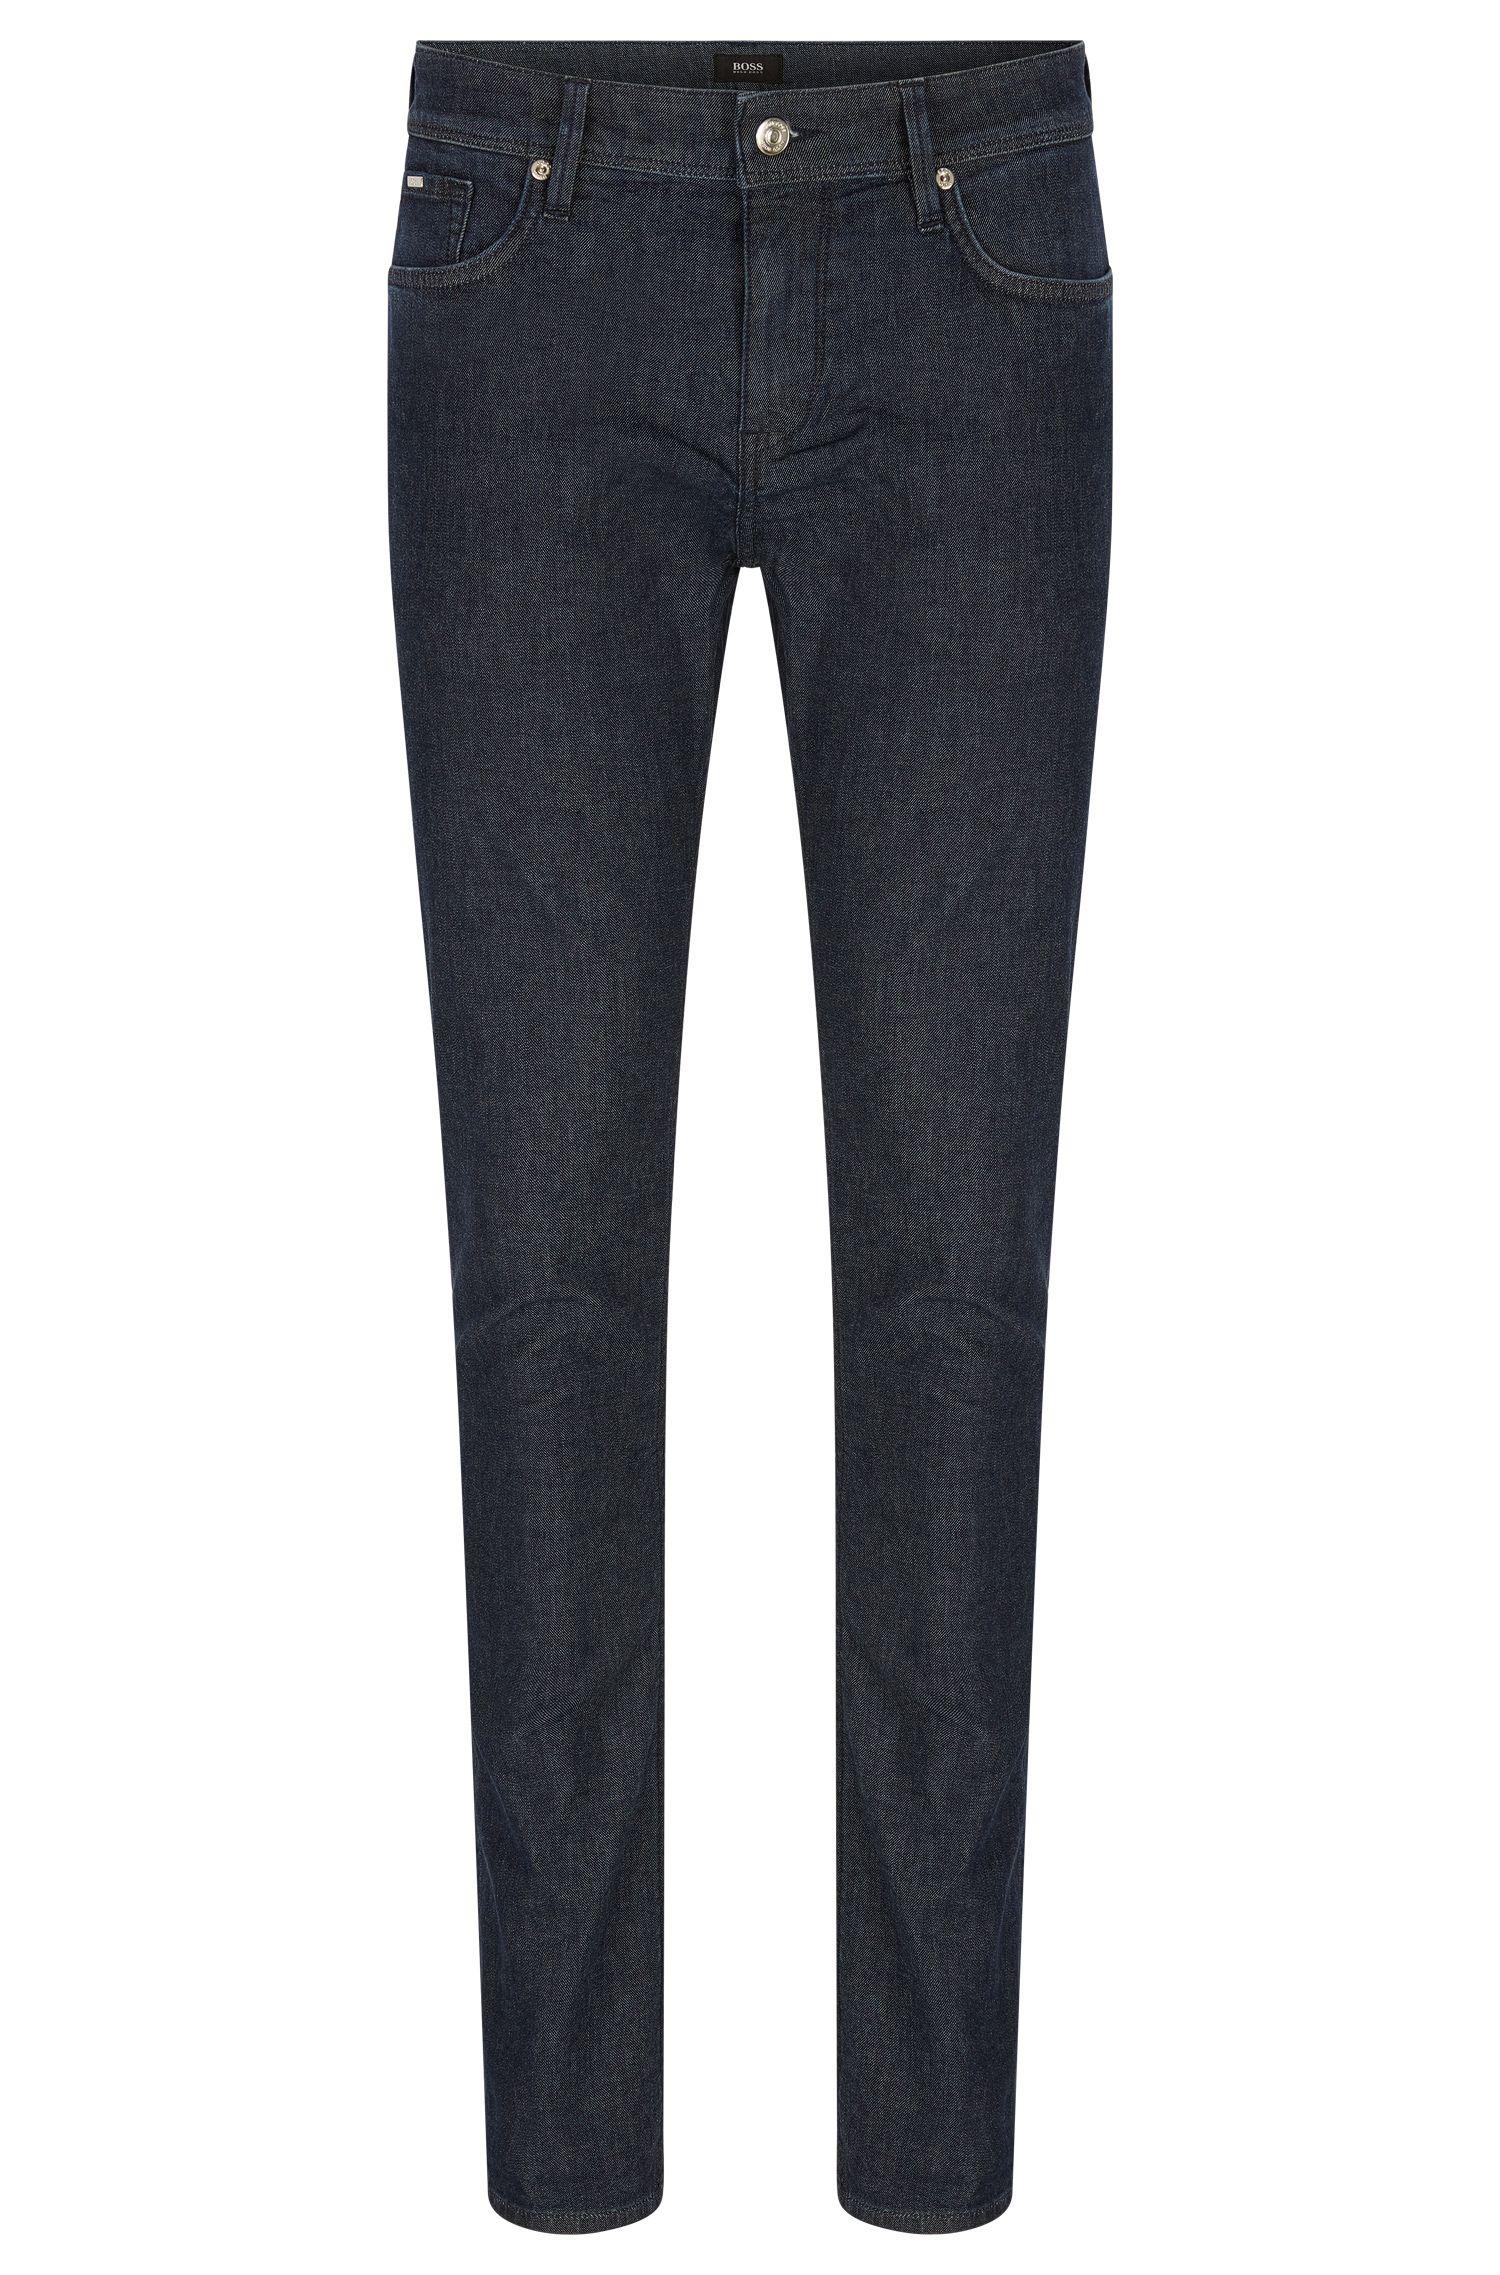 9 oz Stretch Cotton Pant, Slim Fit | Charleston